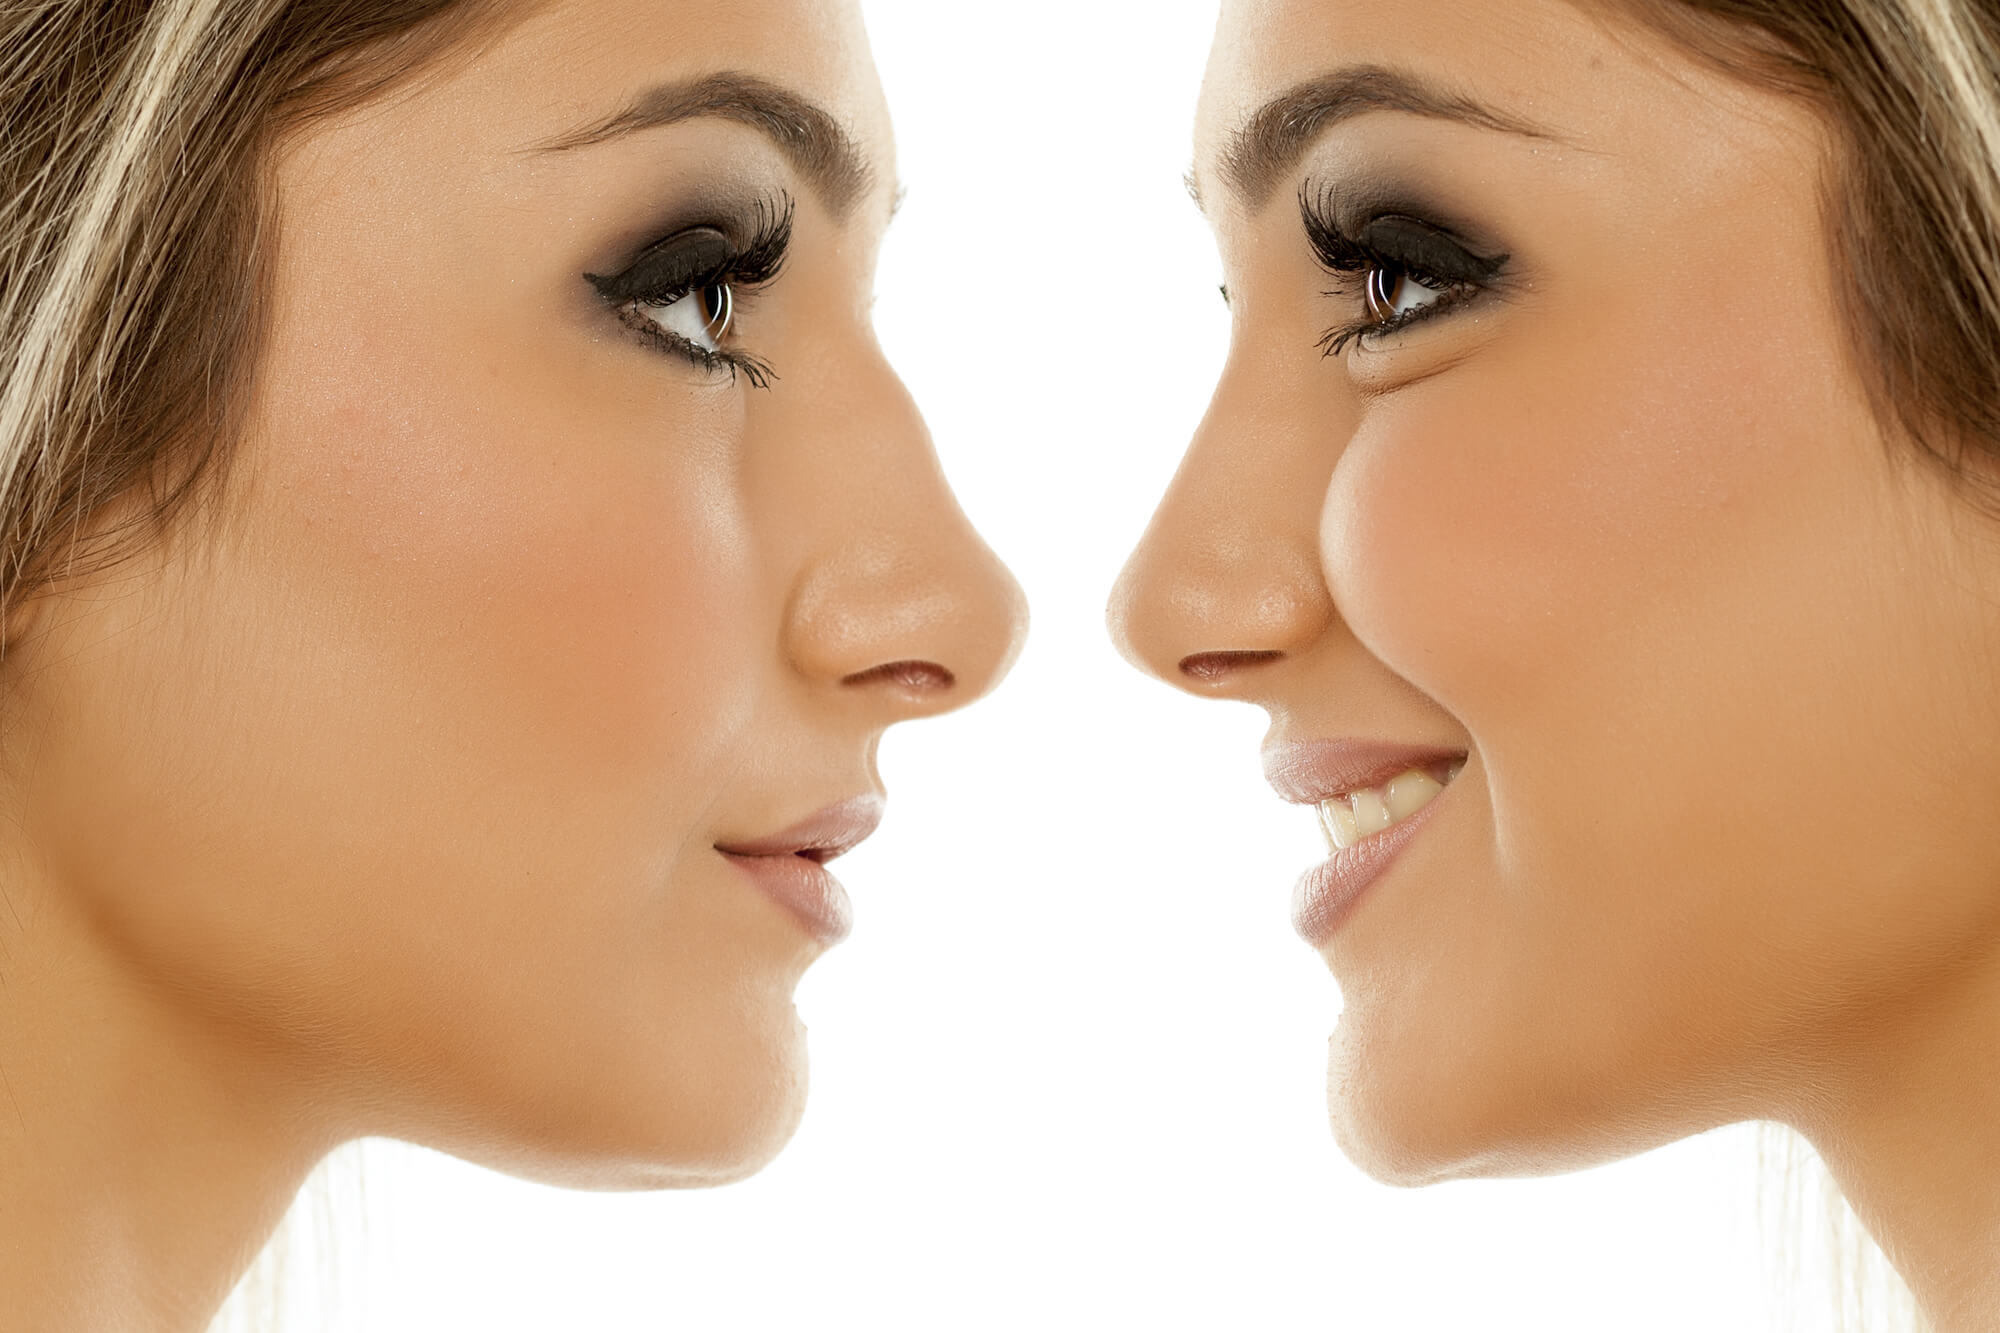 rhinoplasty before and after photos gallery plastic surgery atlanta ga